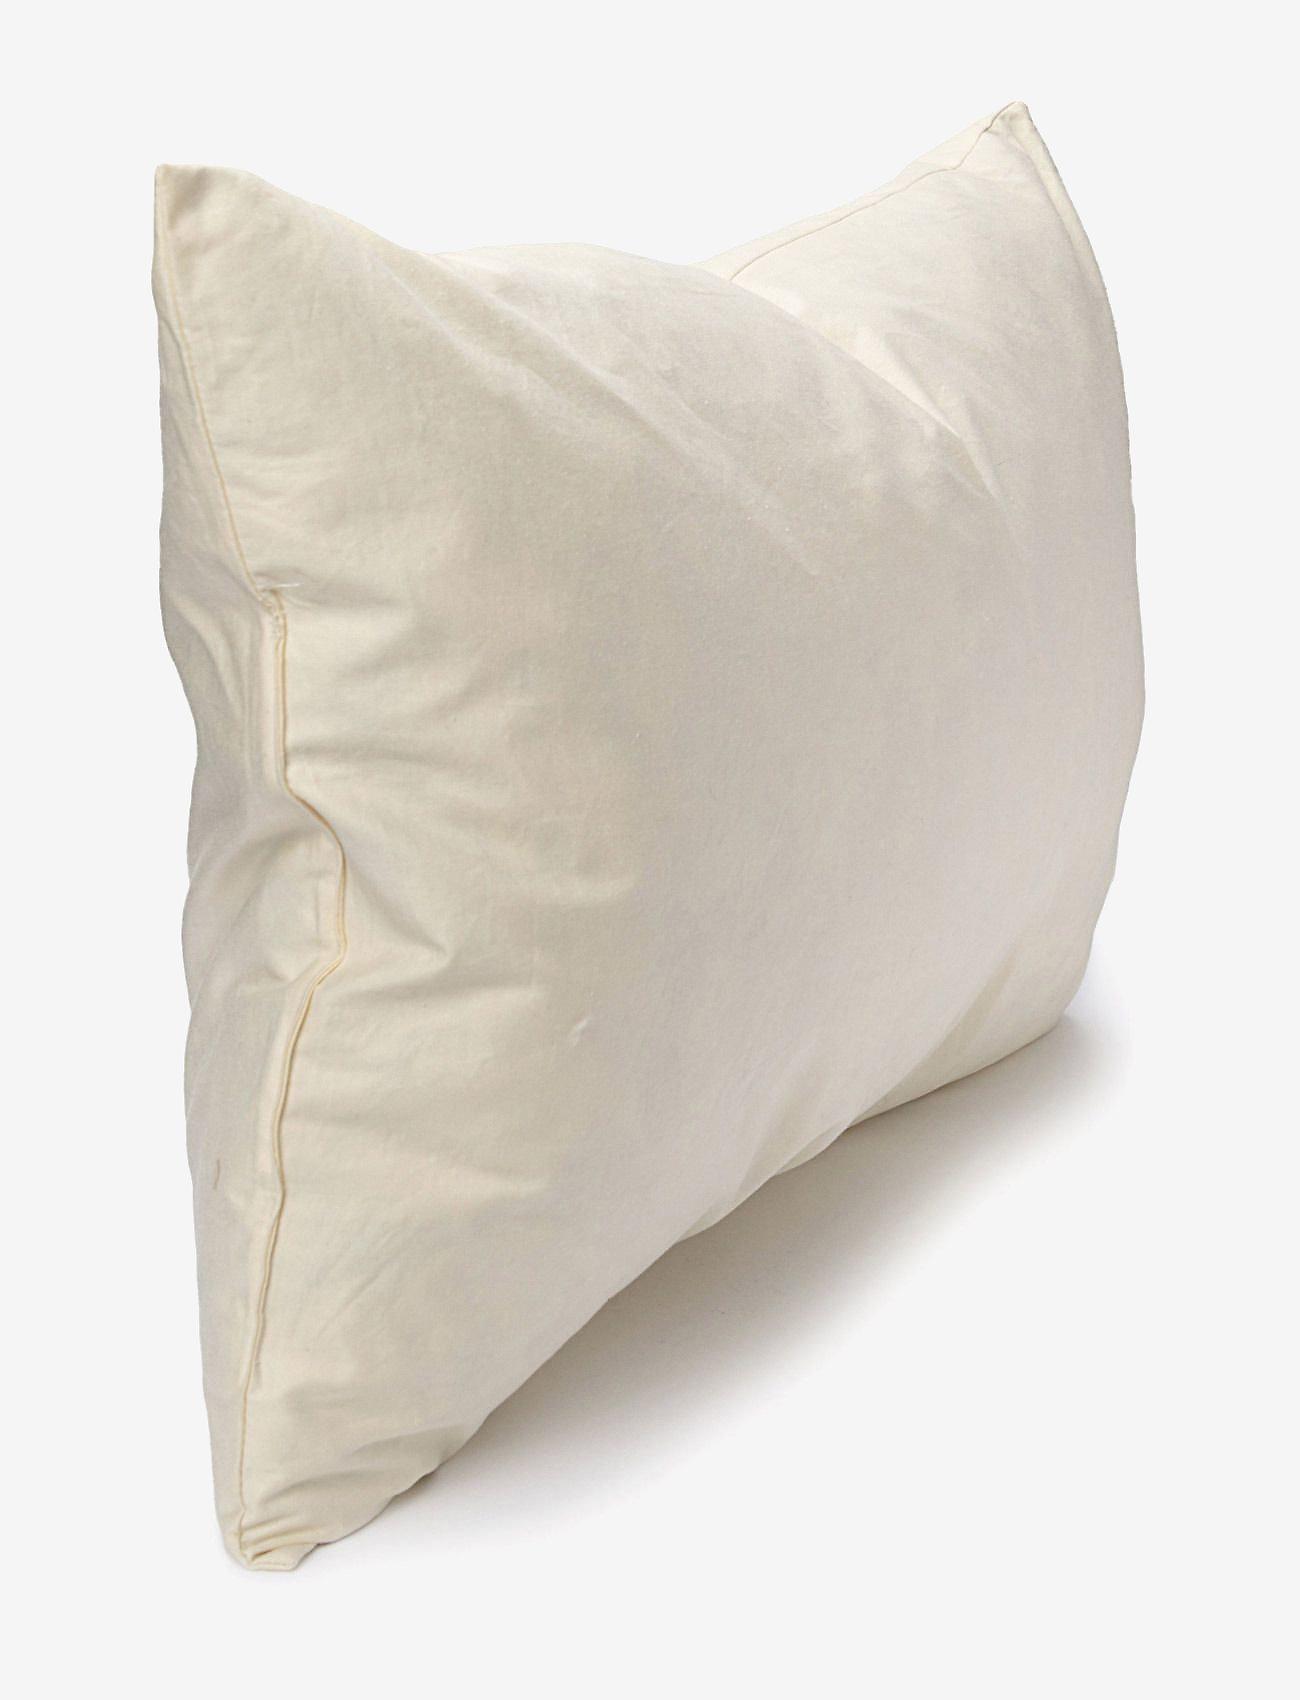 DAY Home - Cushion filling - iekšējie spilveni - natural - 1